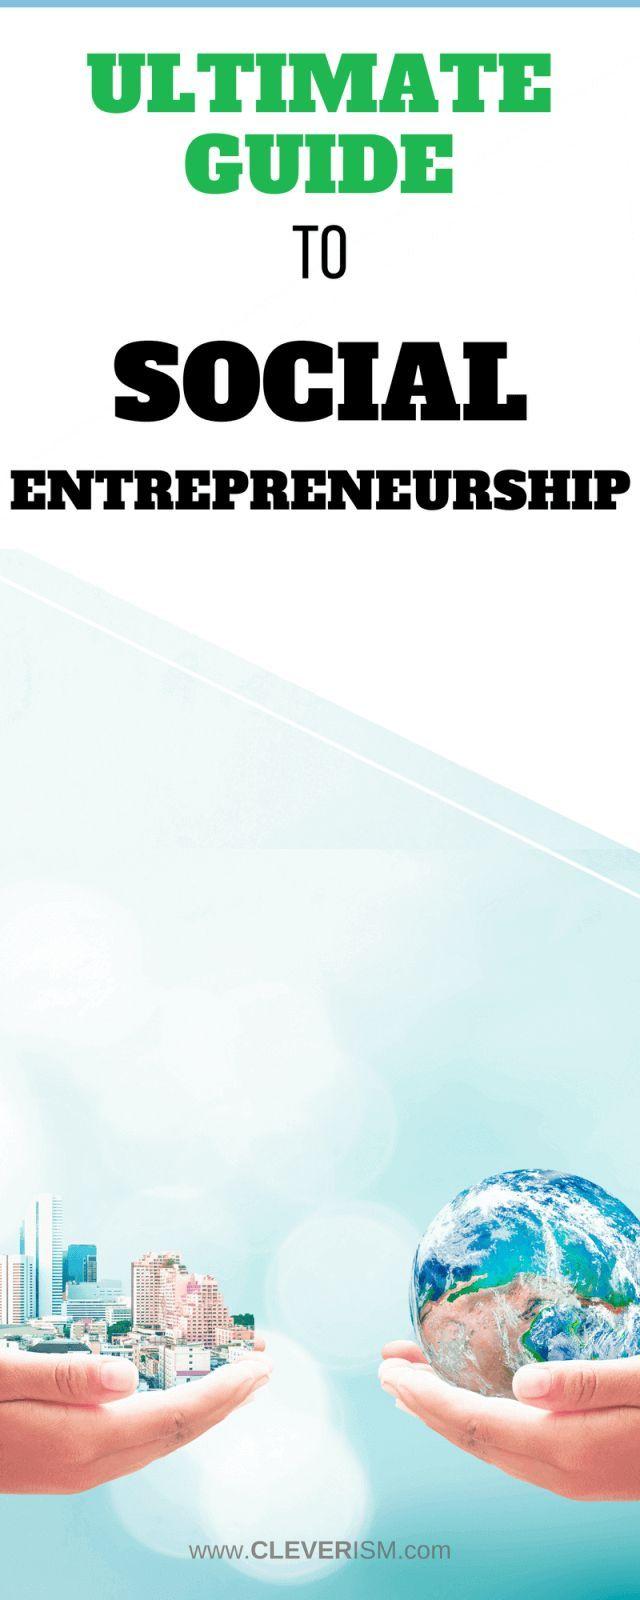 ultimate guide to social entrepreneurship | social entrepreneurship